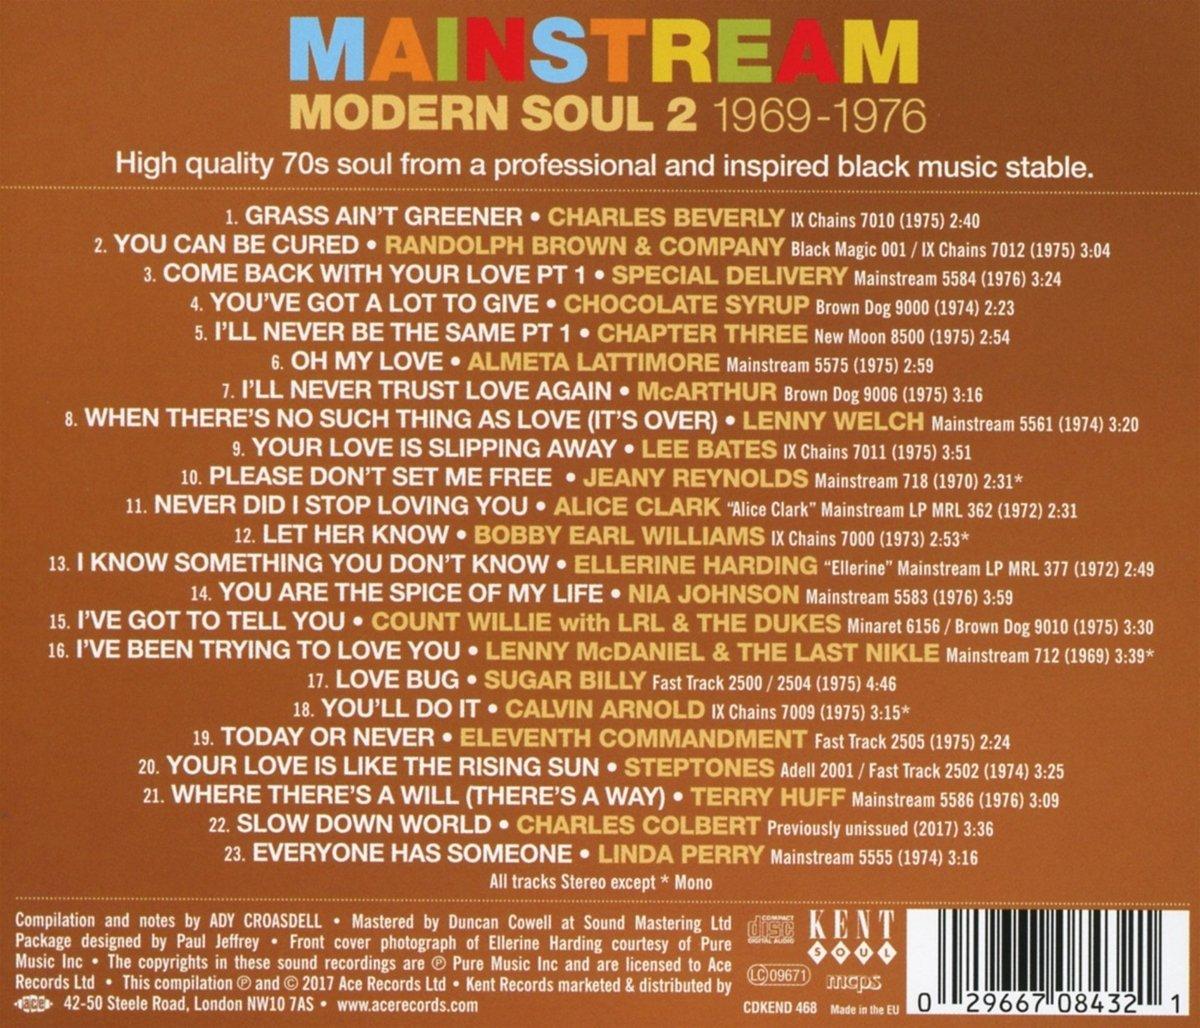 Mainstream Modern Soul 2 - Various: Amazon de: Musik